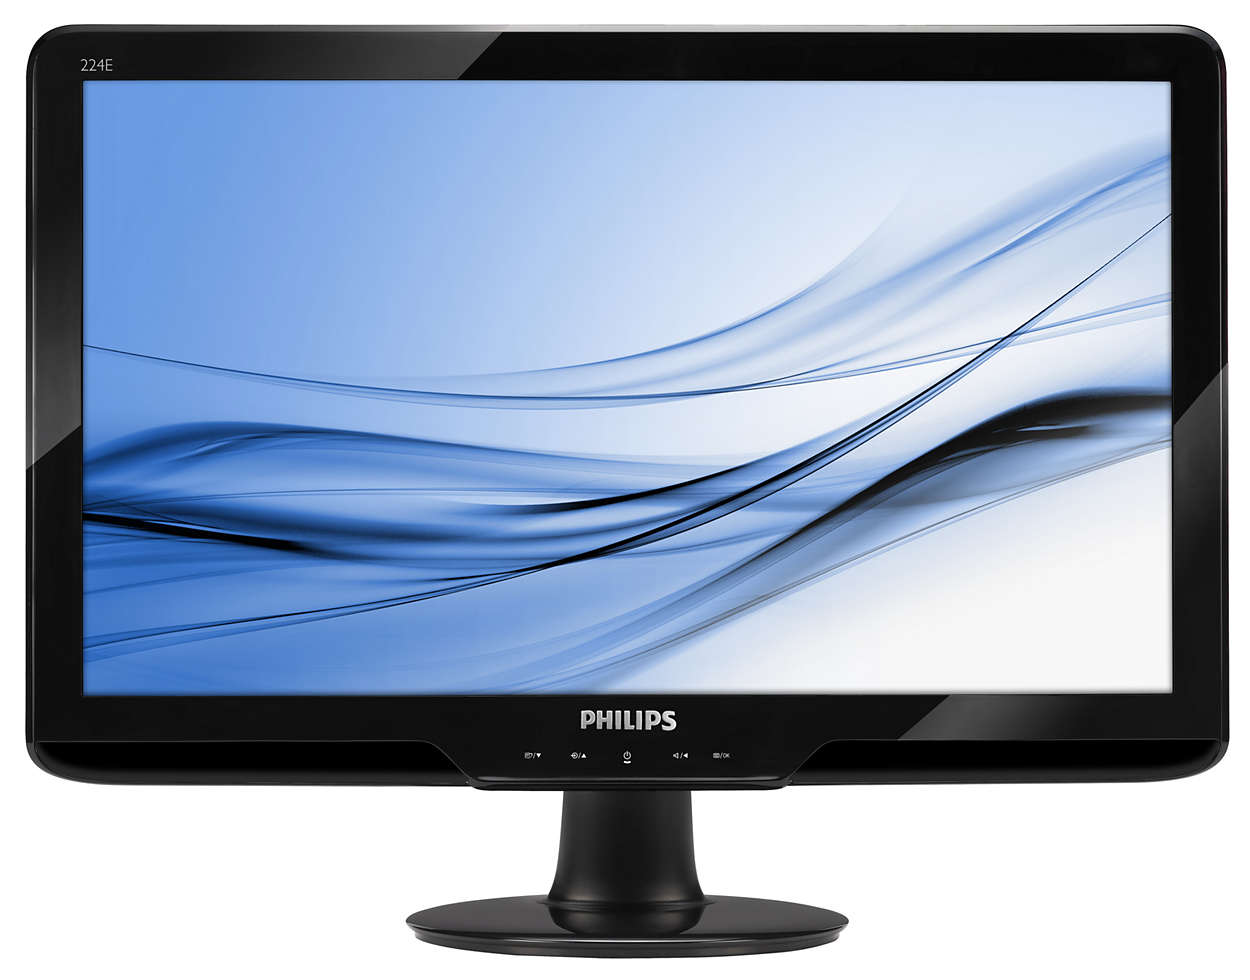 Elegantní HDMI displej pro zábavu vrozlišení Full-HD